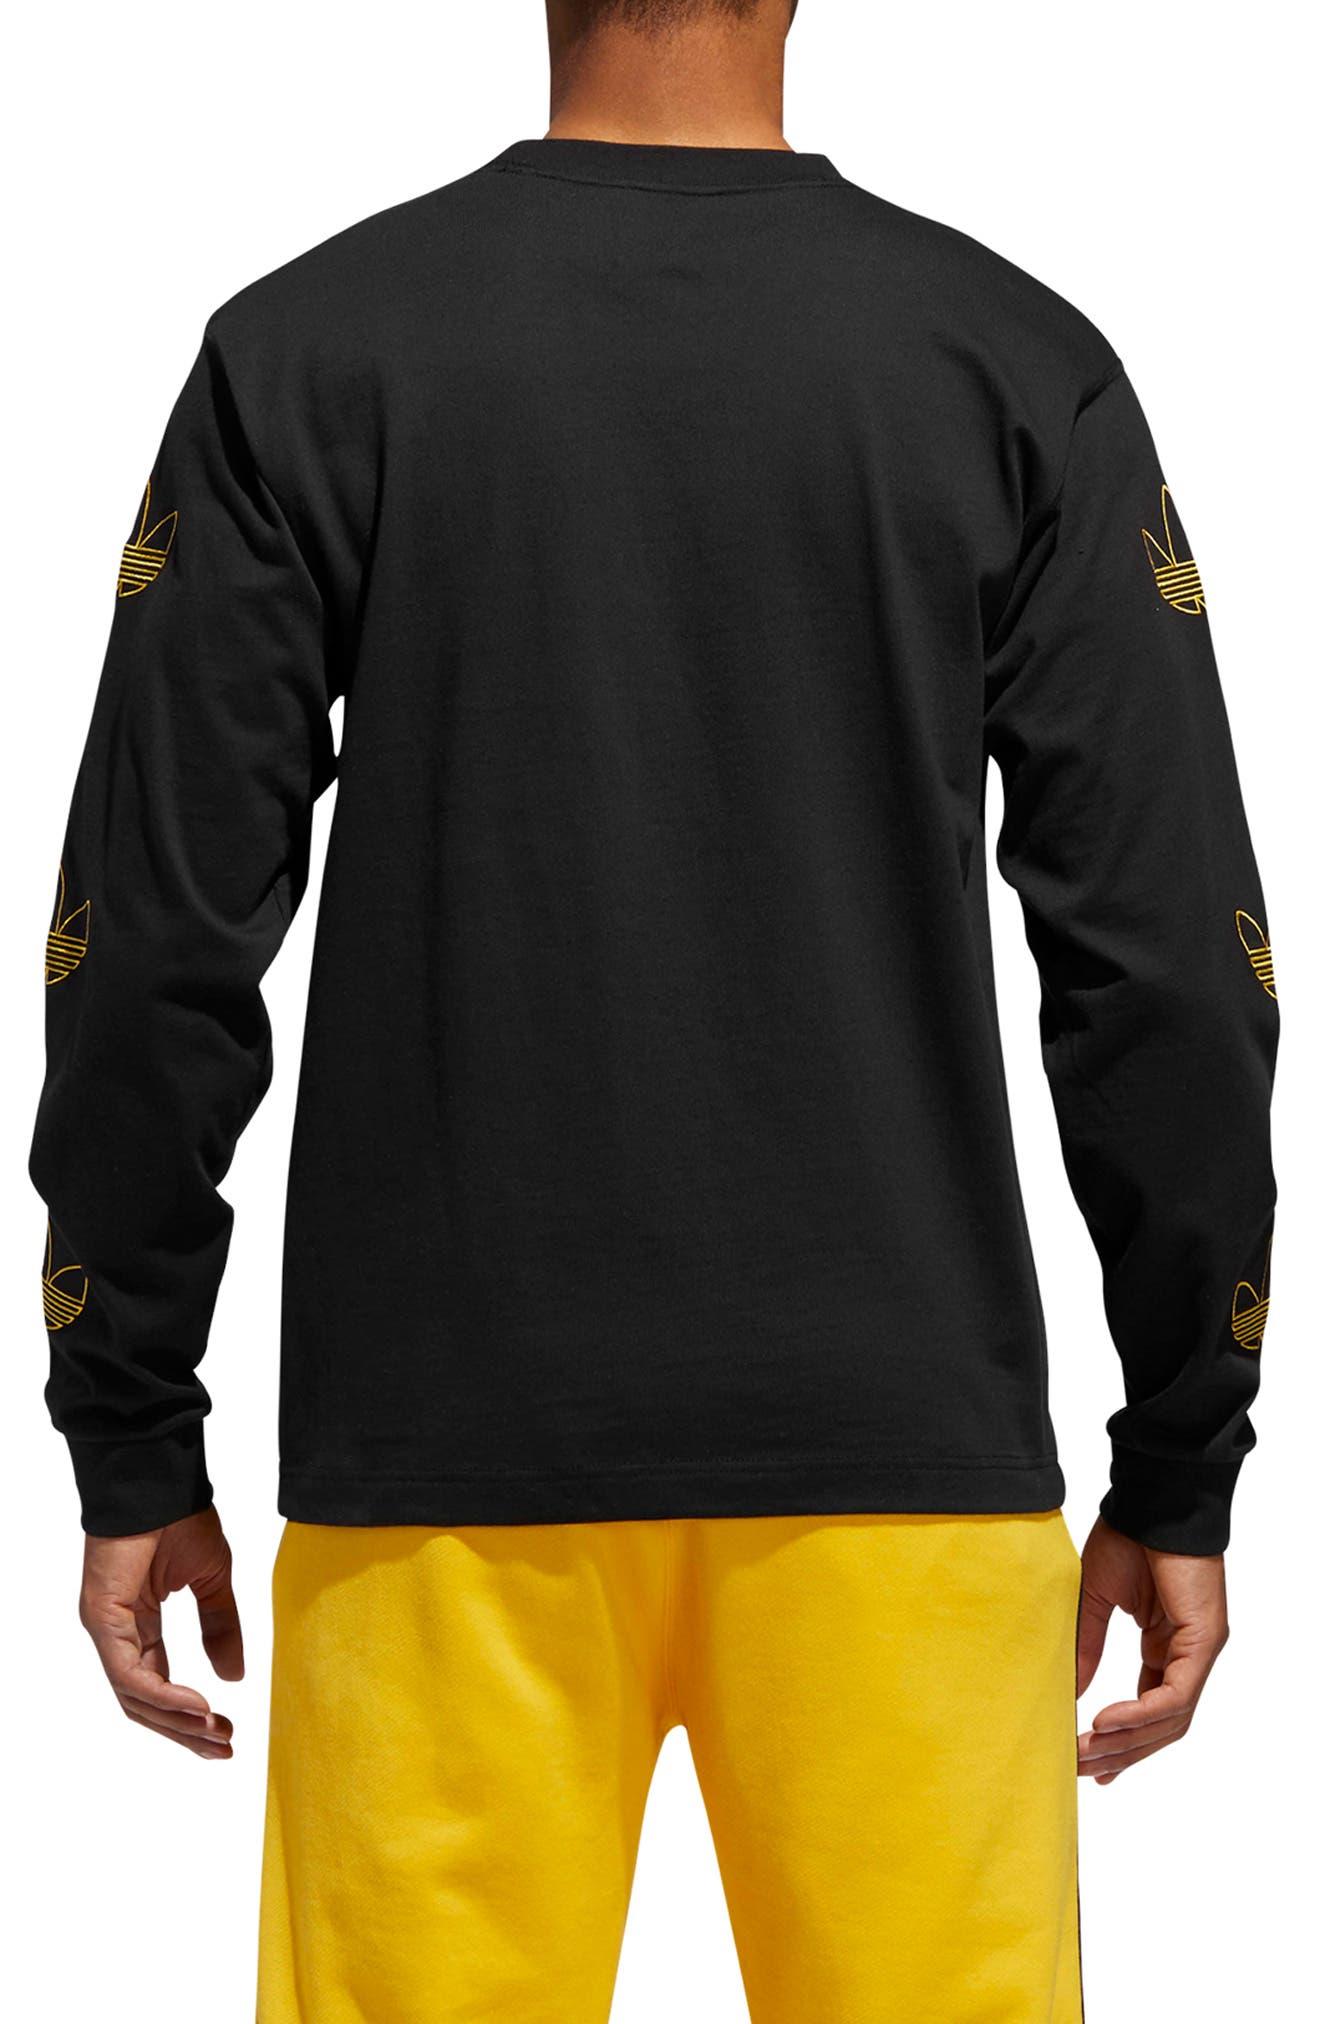 ADIDAS ORIGINALS, Embroidered Trefoil Long Sleeve T-Shirt, Alternate thumbnail 2, color, BLACK/ WHITE